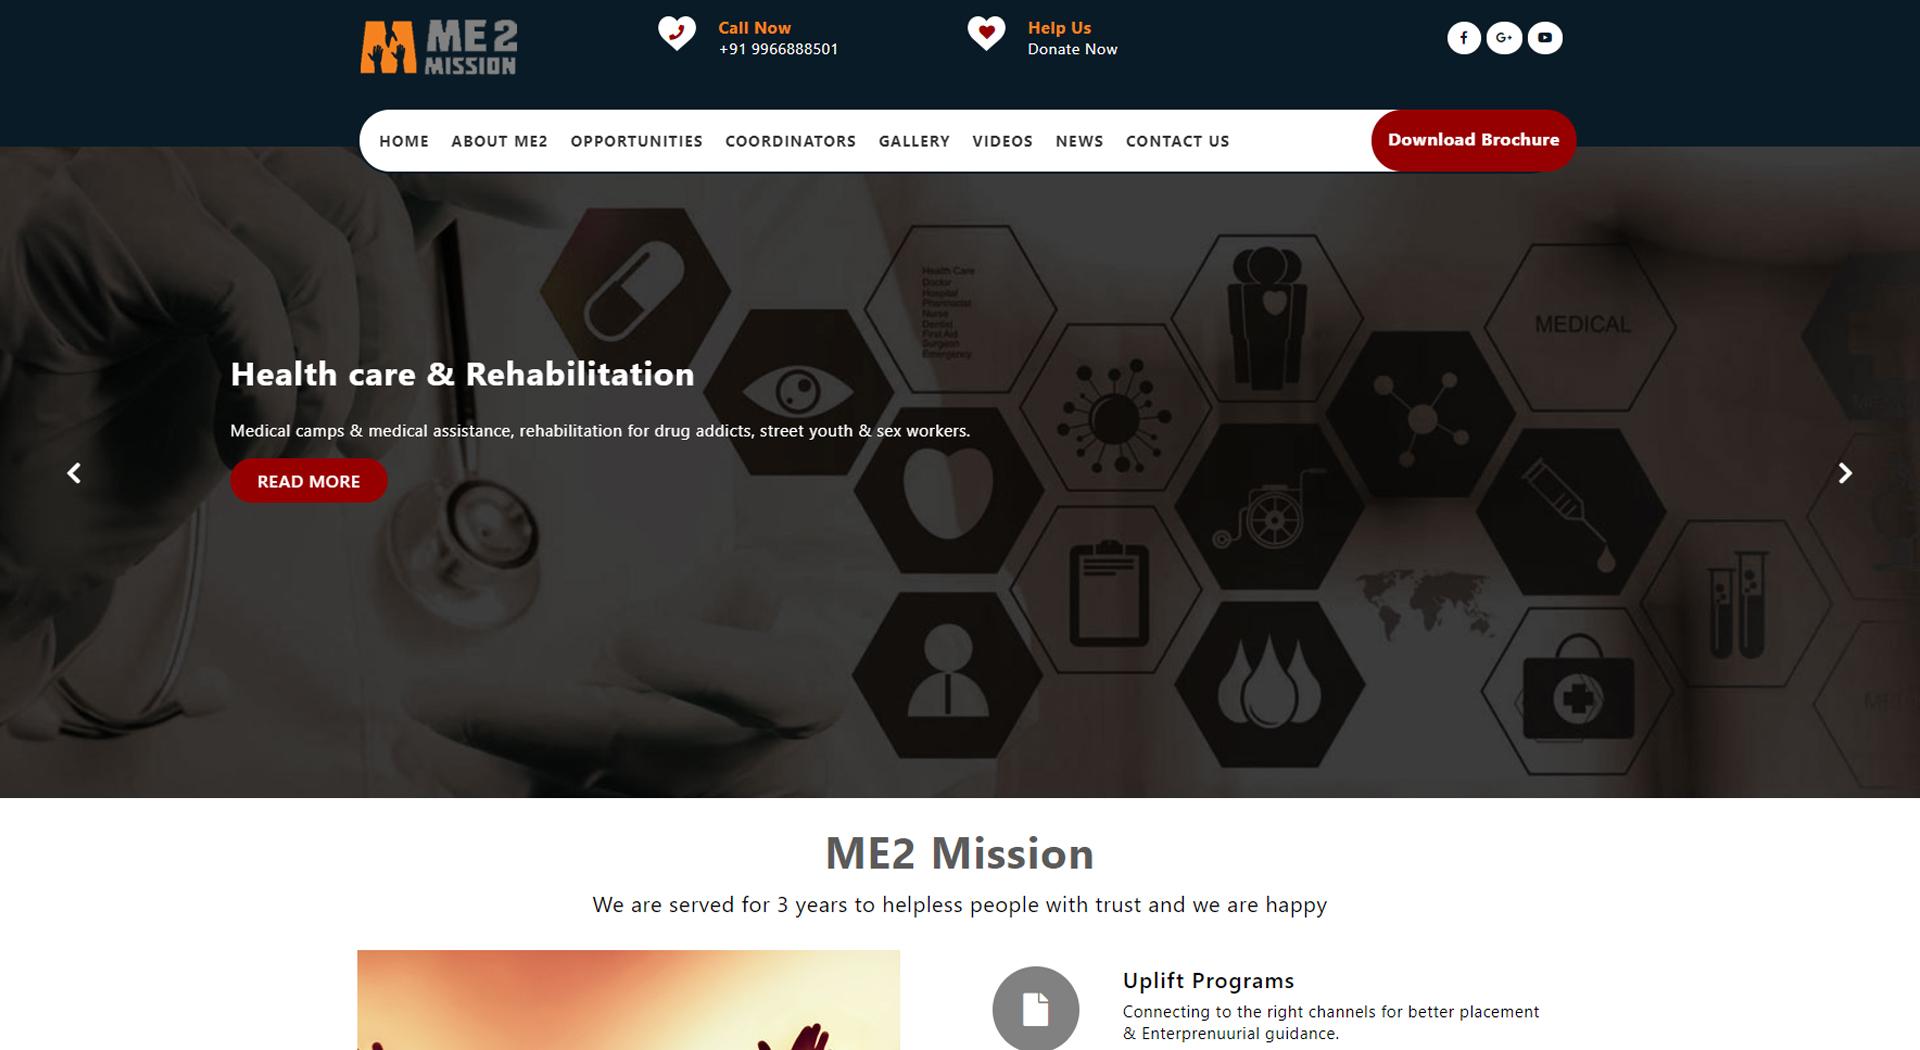 M2 Mission